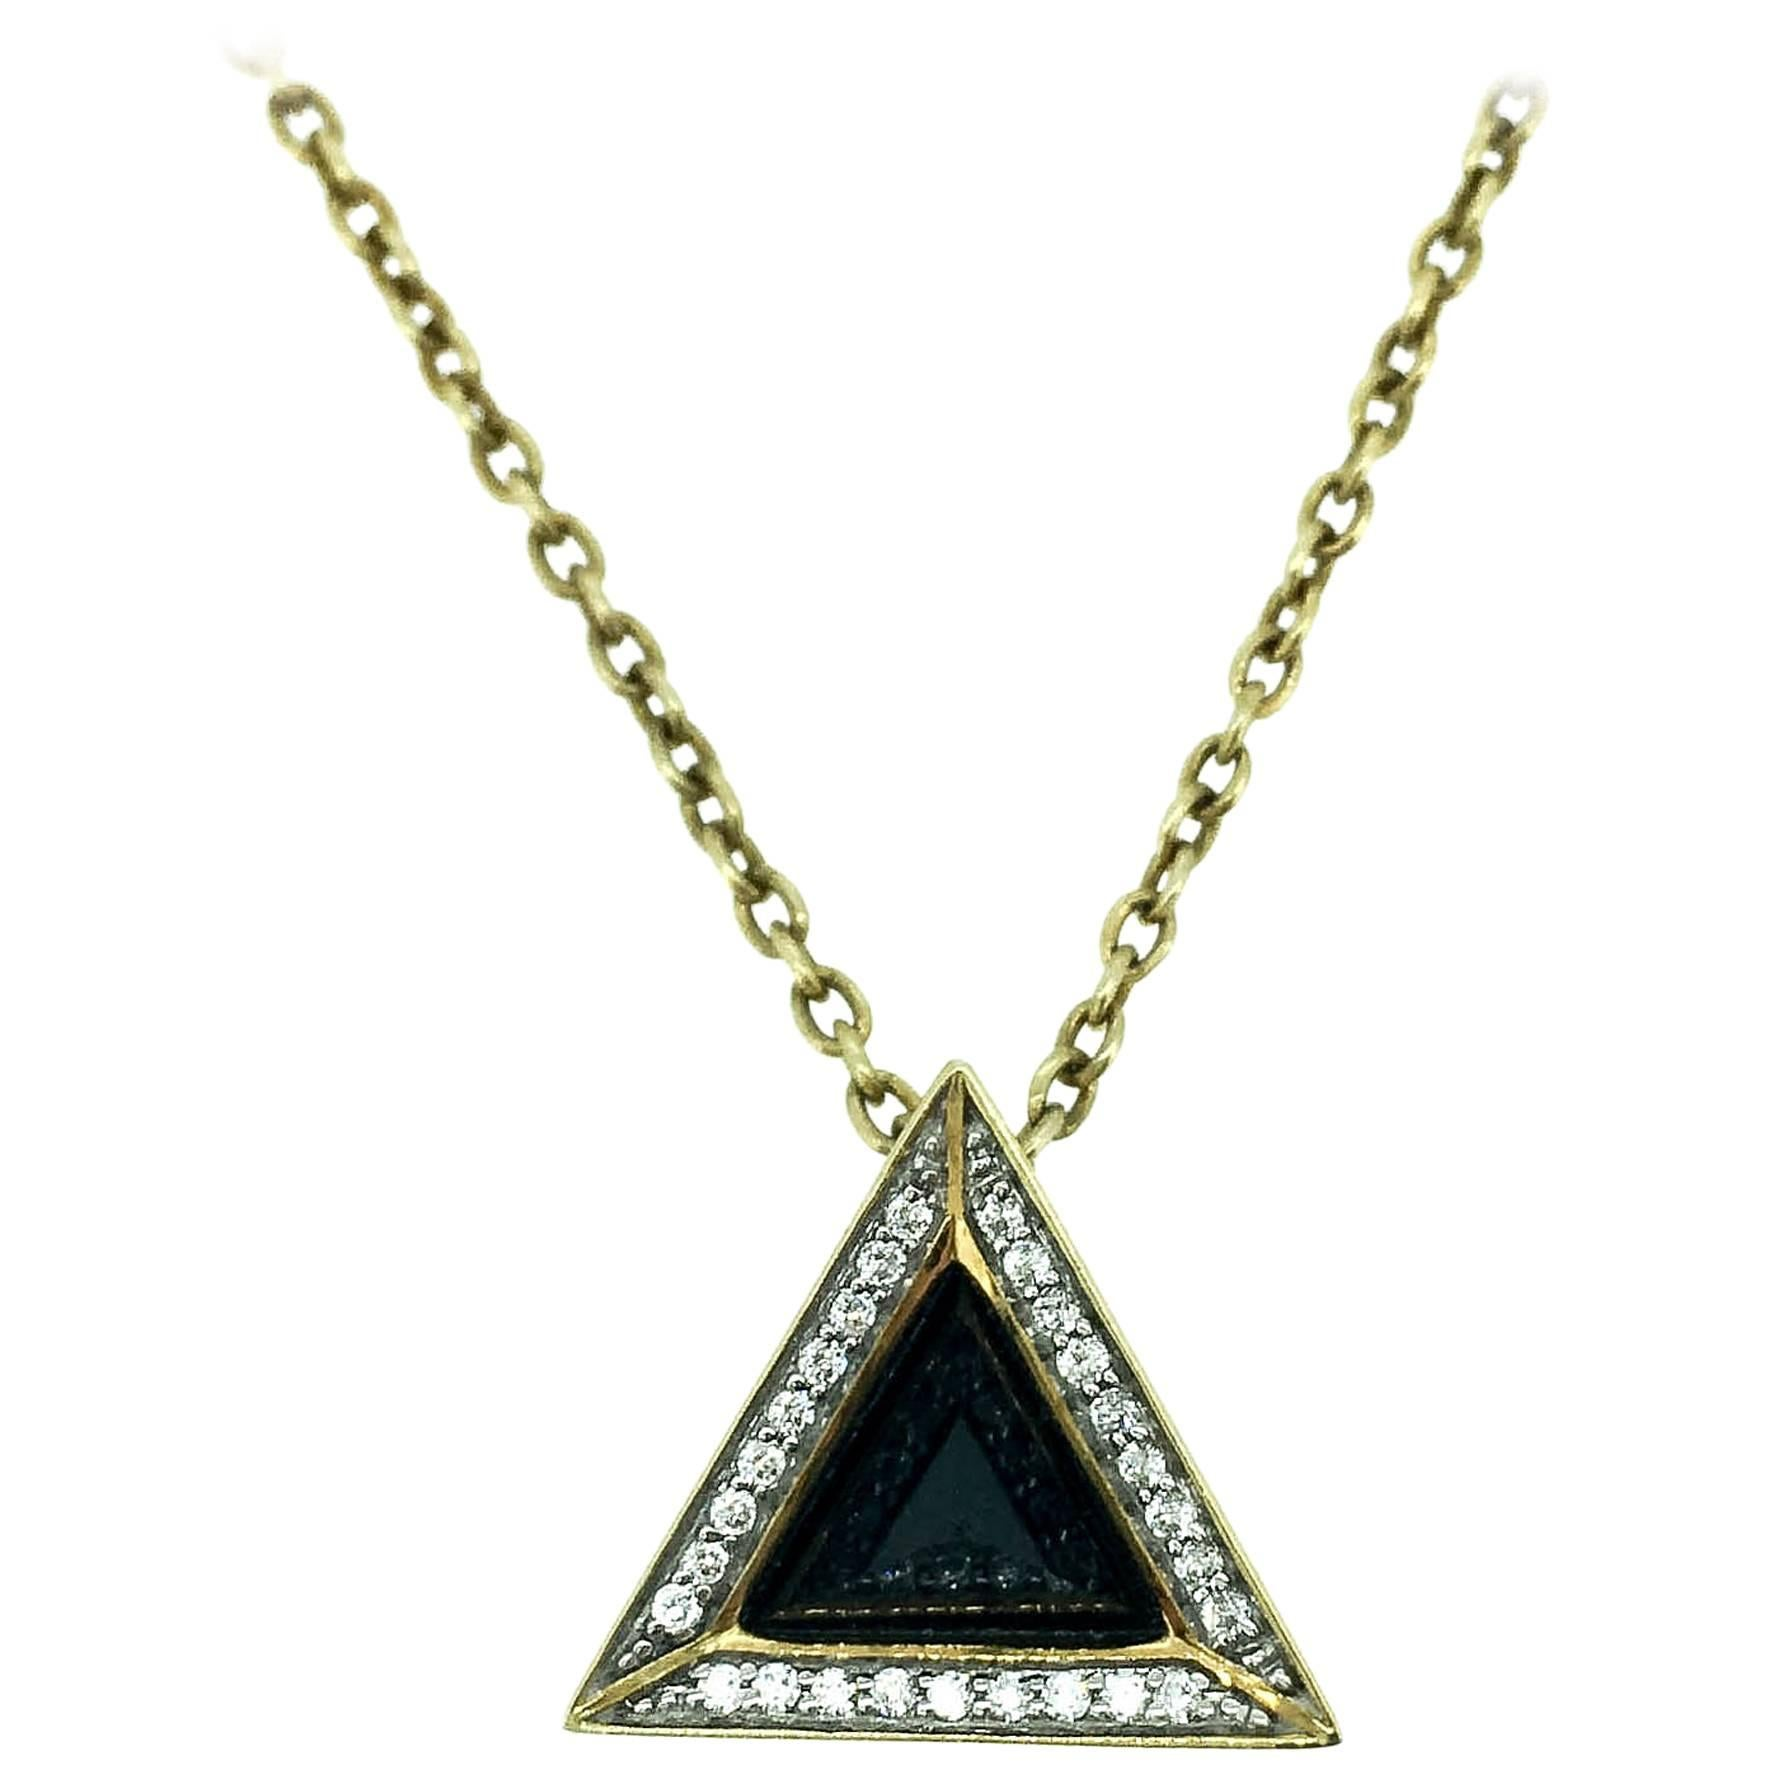 Sapphire Diamond and 18K Gold Black Pyramid Necklace